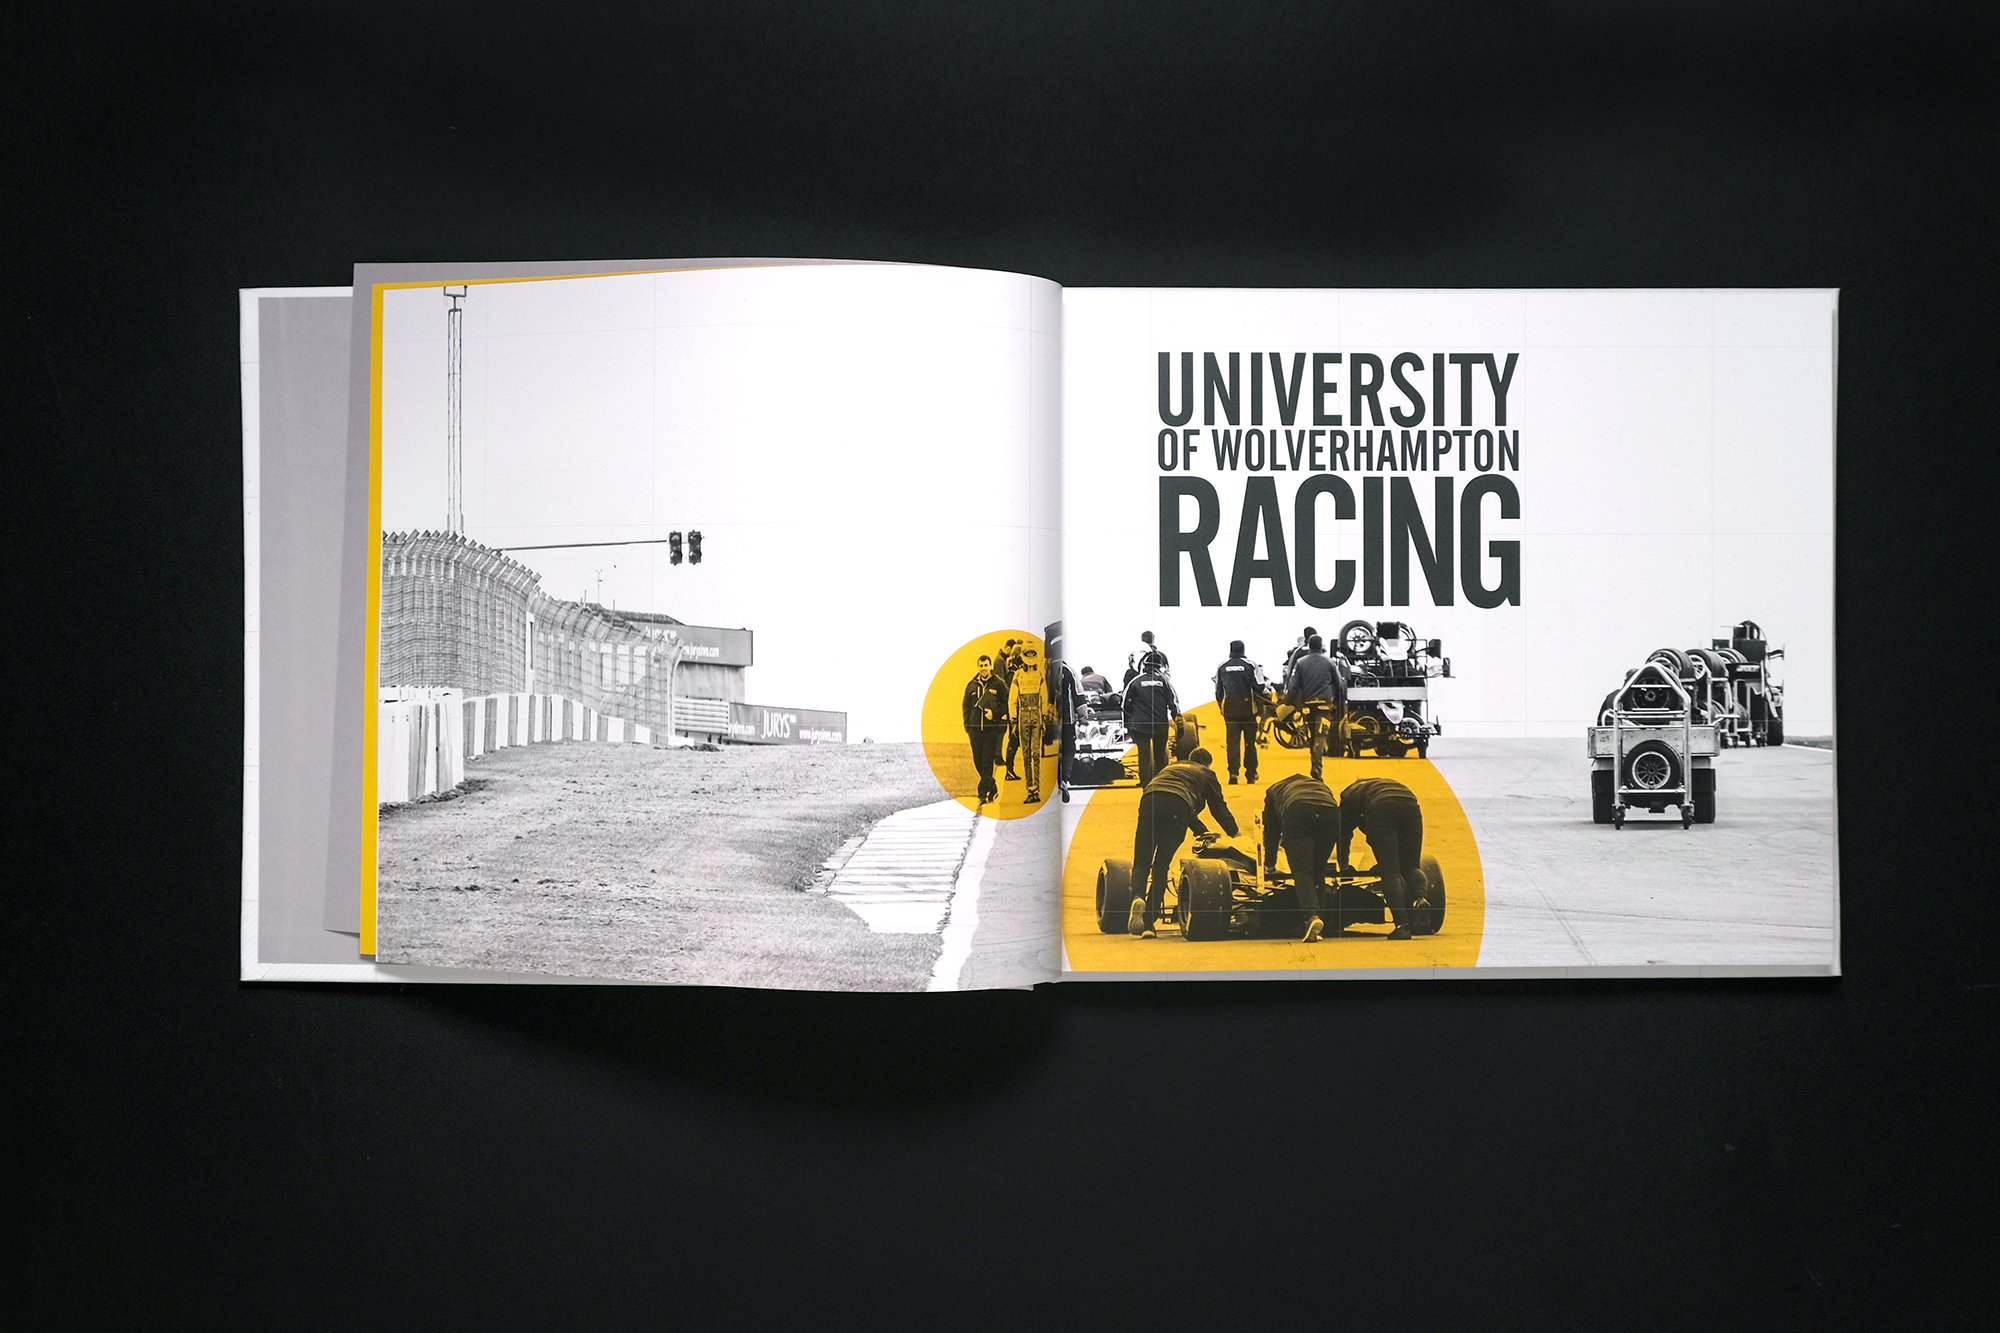 http://rusyndesign.co.uk/wp-content/uploads/2020/04/UWR-19-book-shots-04.jpg